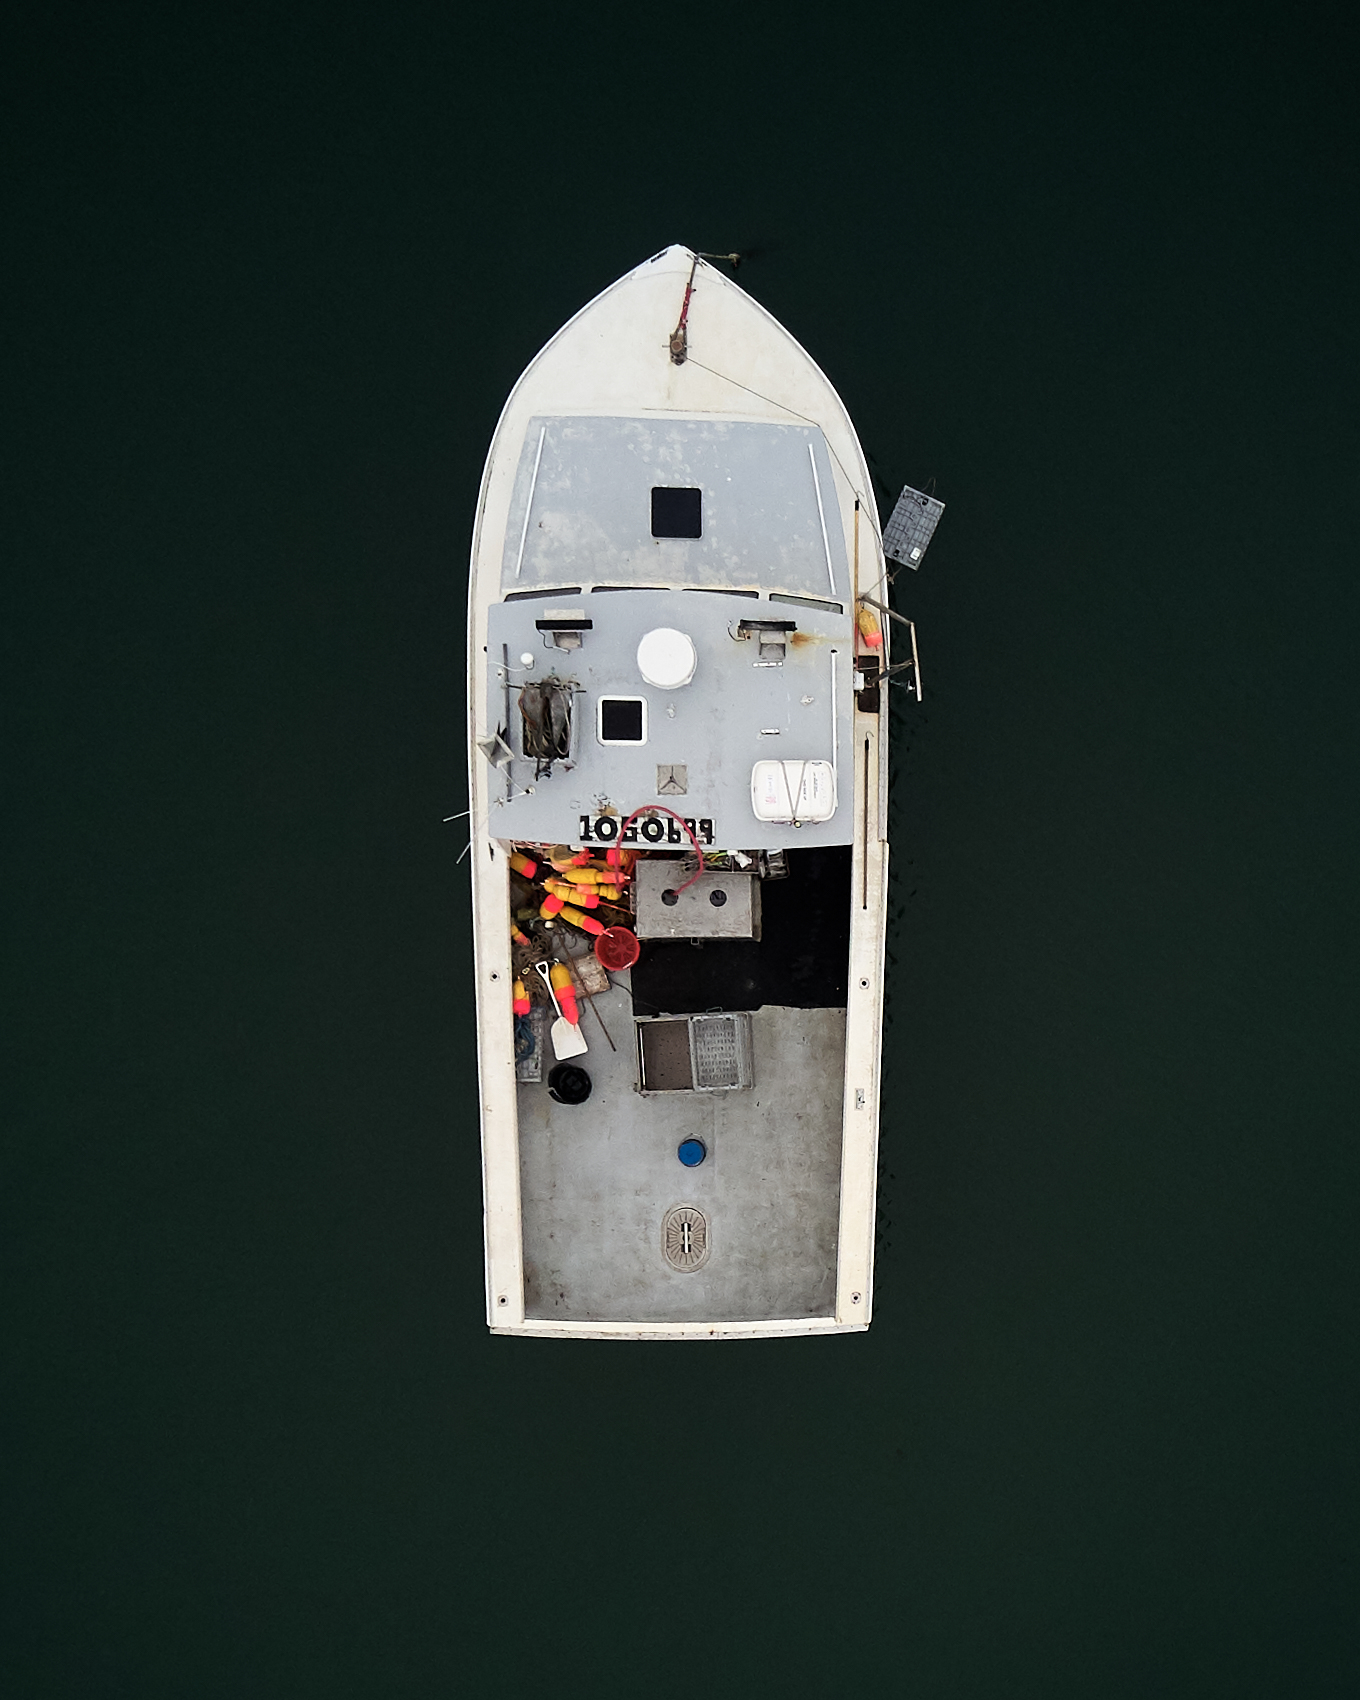 DroneVF_D1-32_LR.jpg